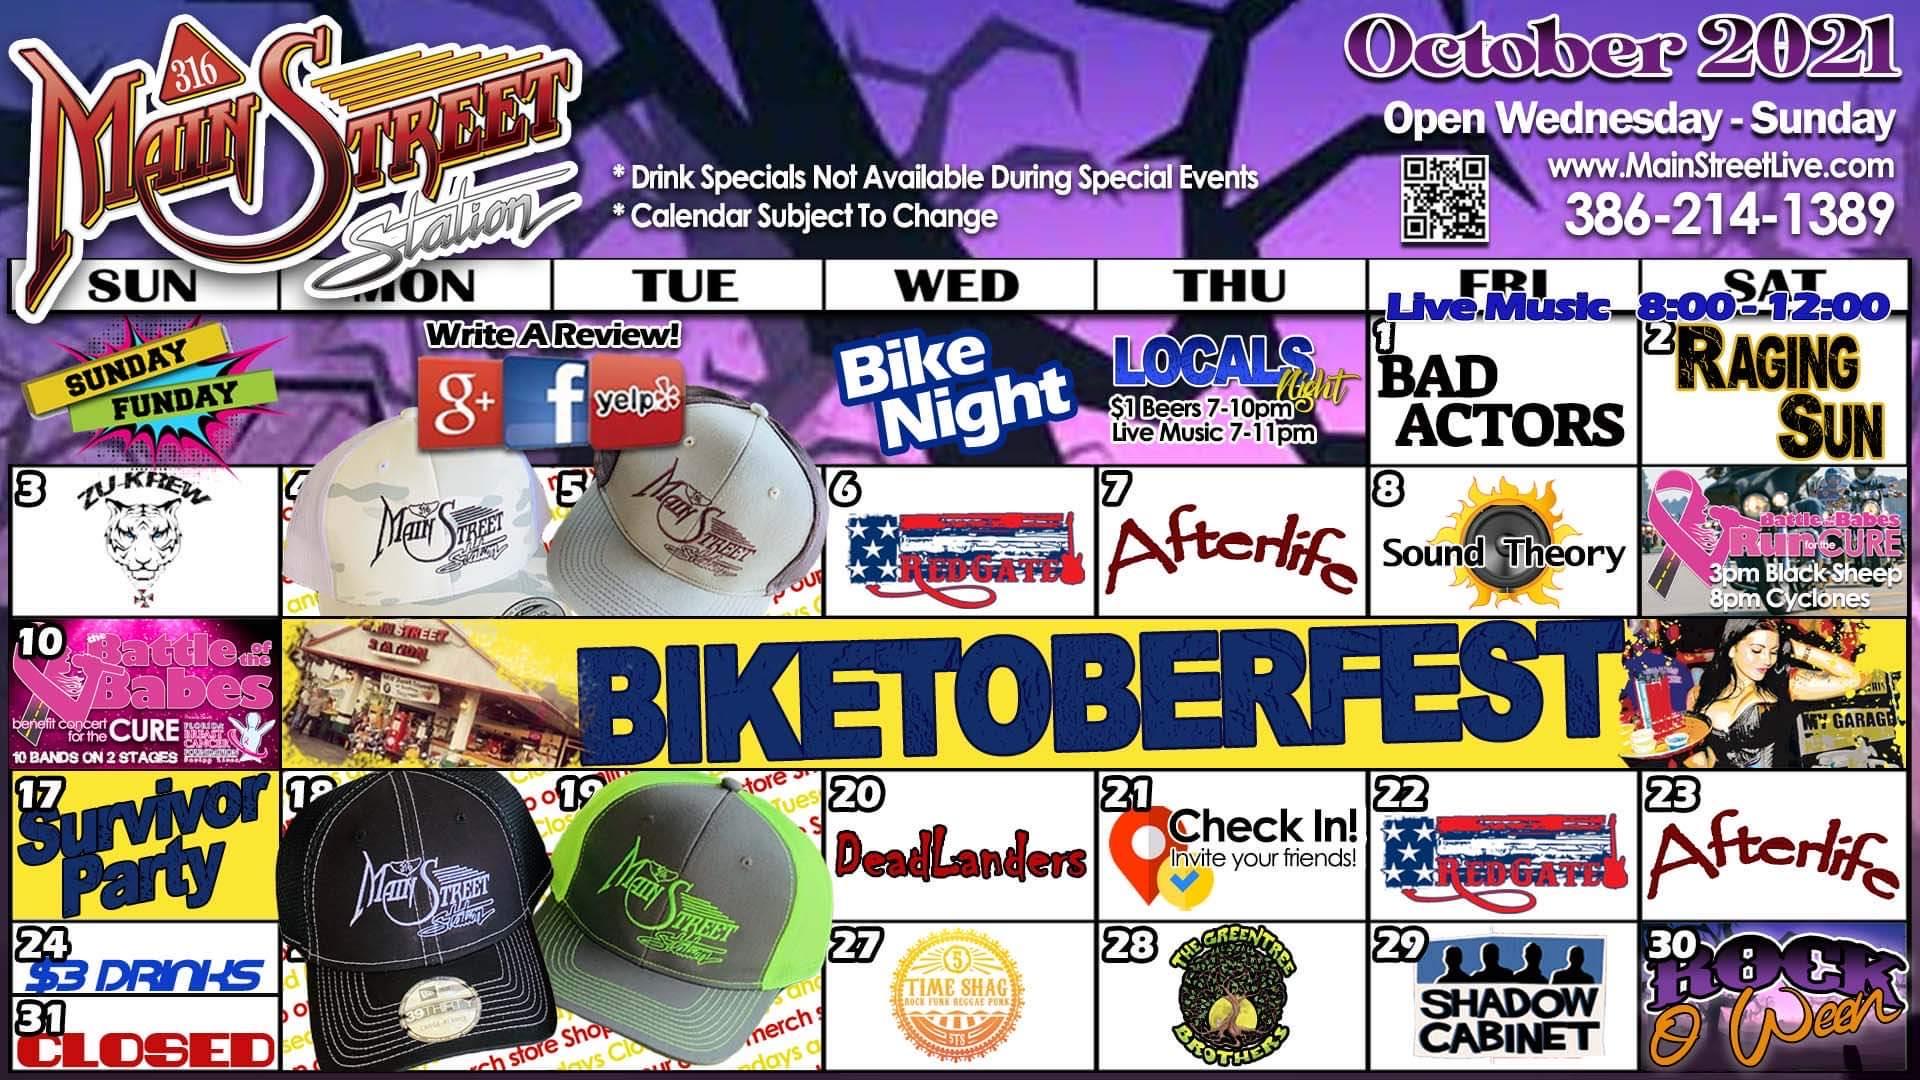 october 2021 event calendar 316 mainstreet station daytona beach garage bar live music